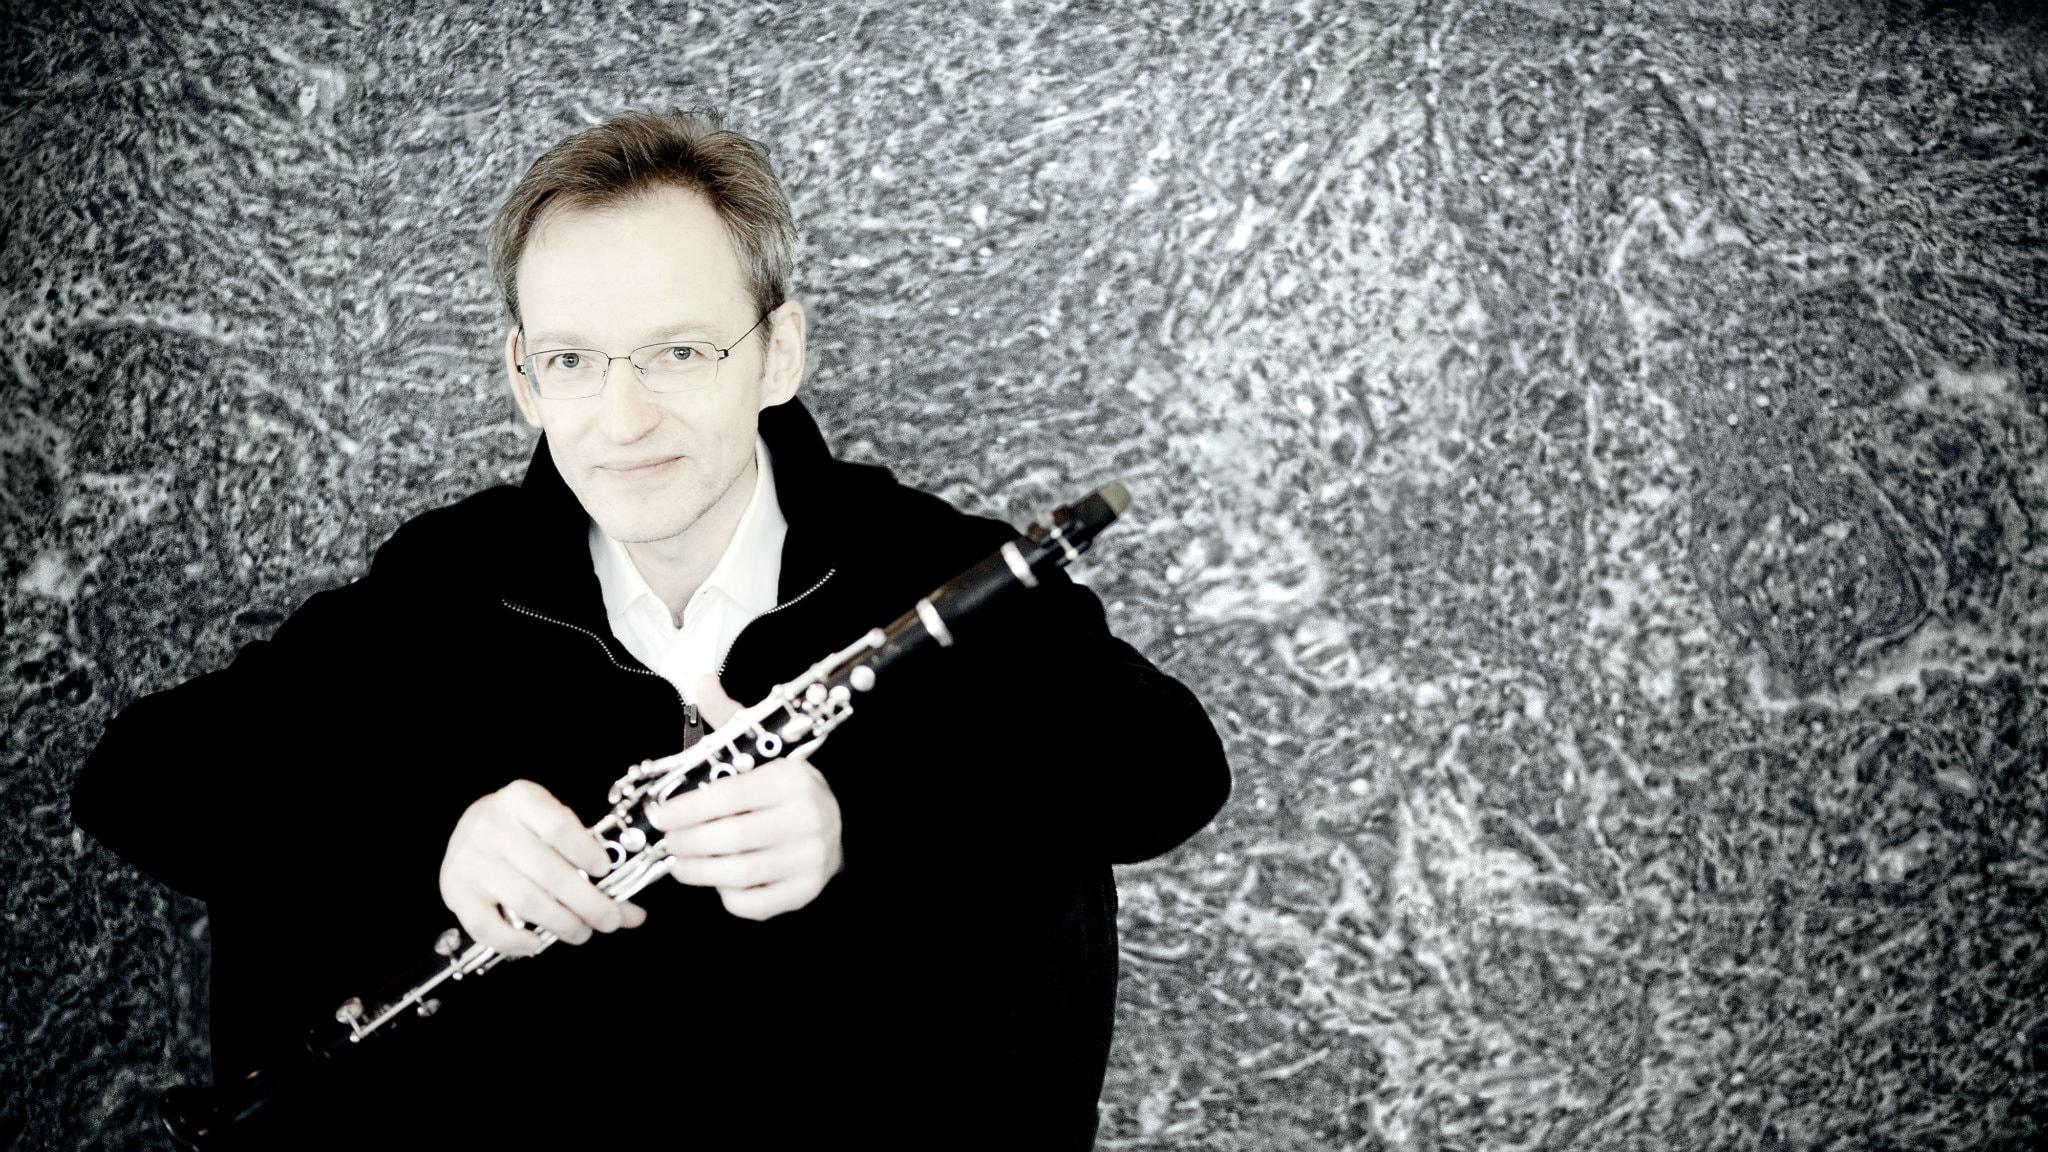 Den finländske klarinettisten Kari Kriikku. Pressbild/Marco Borggreve